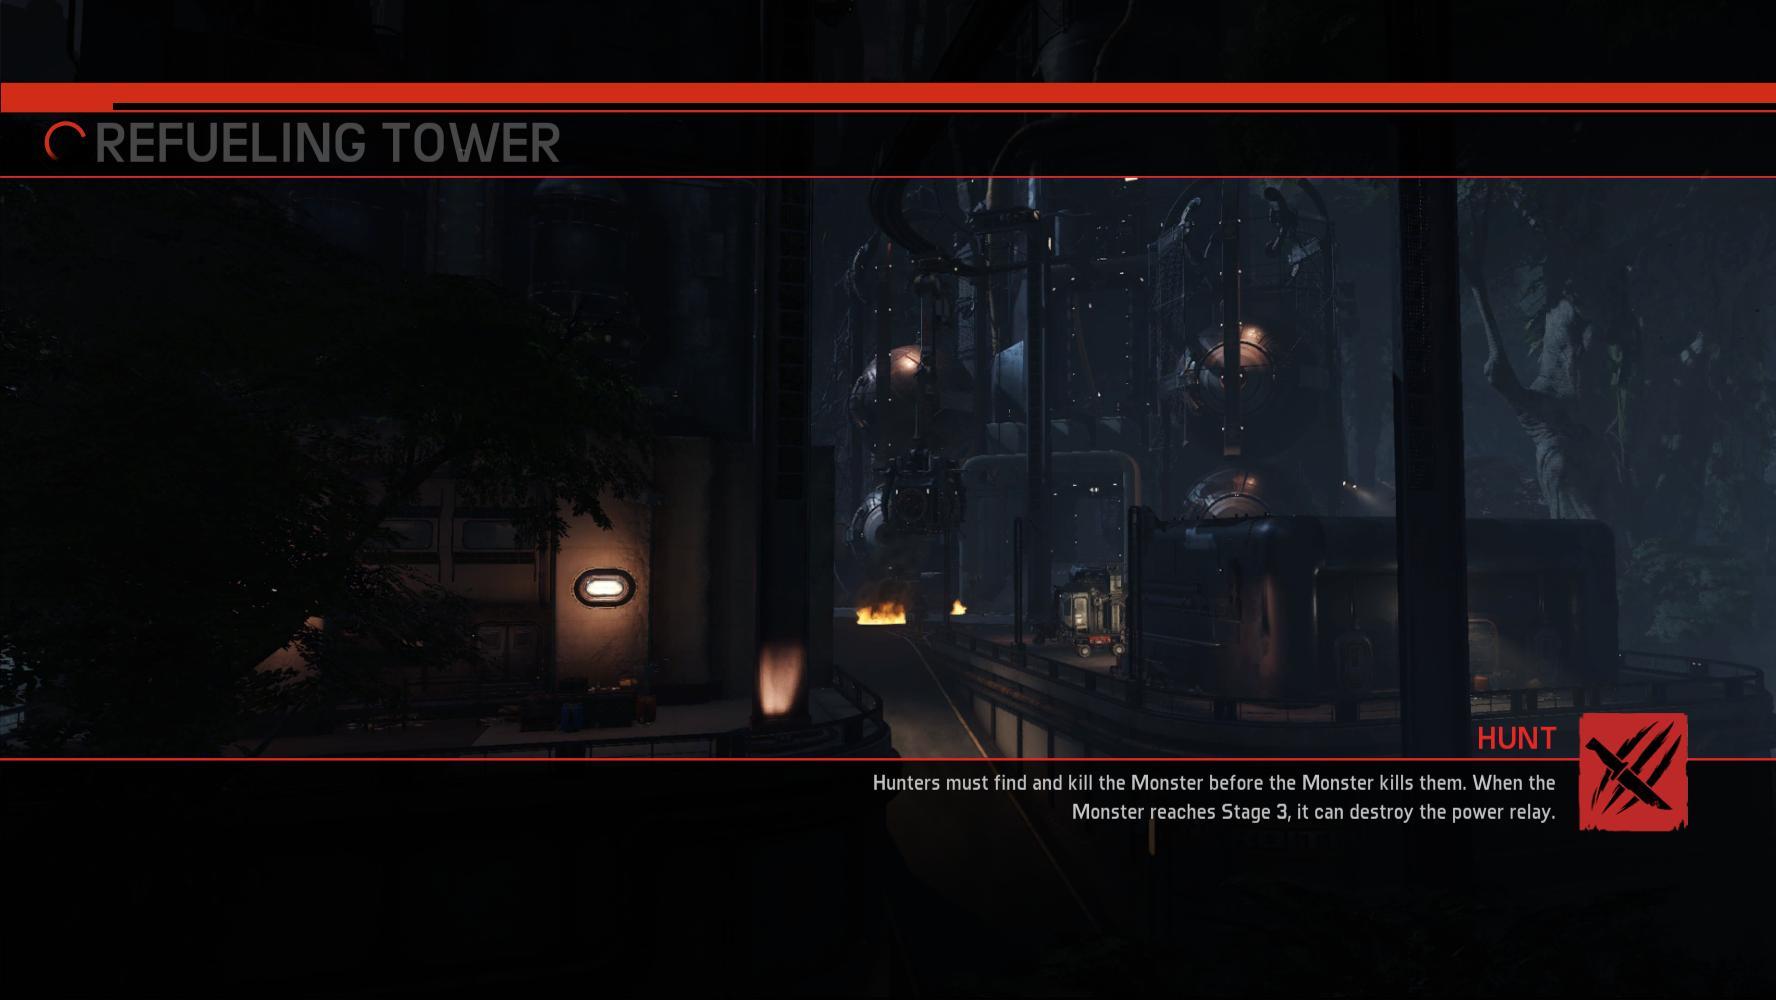 Image Refueling Tower Screenshots 1jpg Evolve Wiki FANDOM - Power Relay Evolve